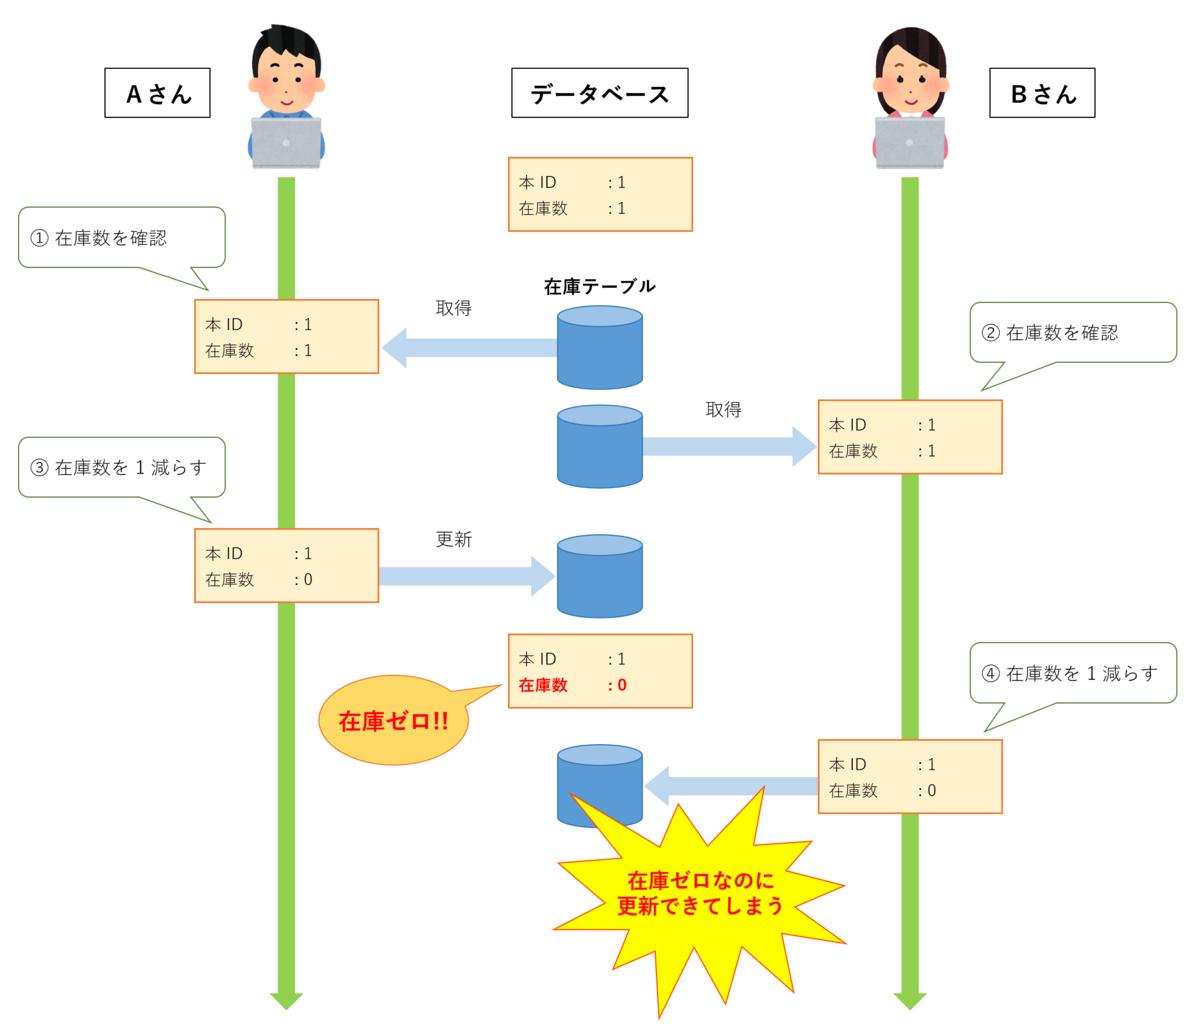 f:id:akiyoko:20201127234524p:plain